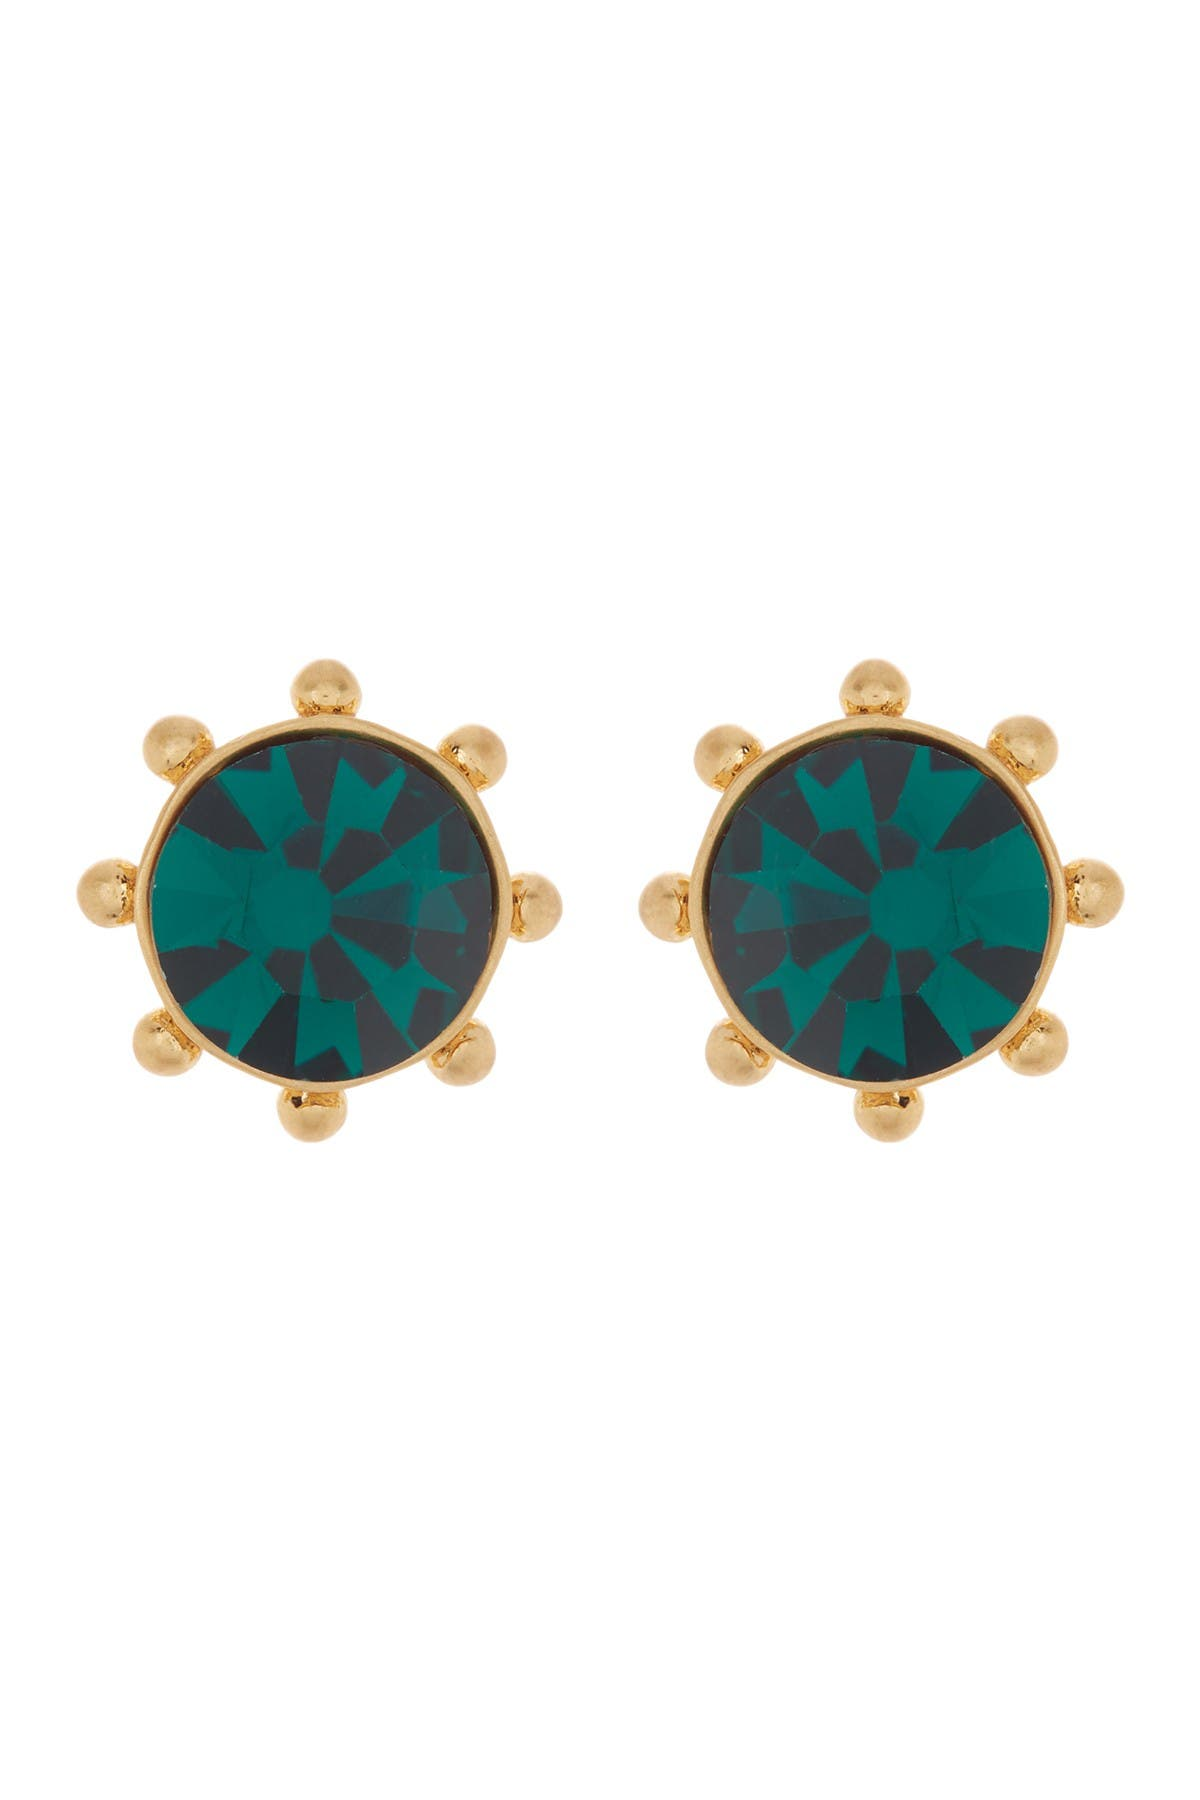 Image of kate spade new york gold-tone bezel set crystal stud earrings